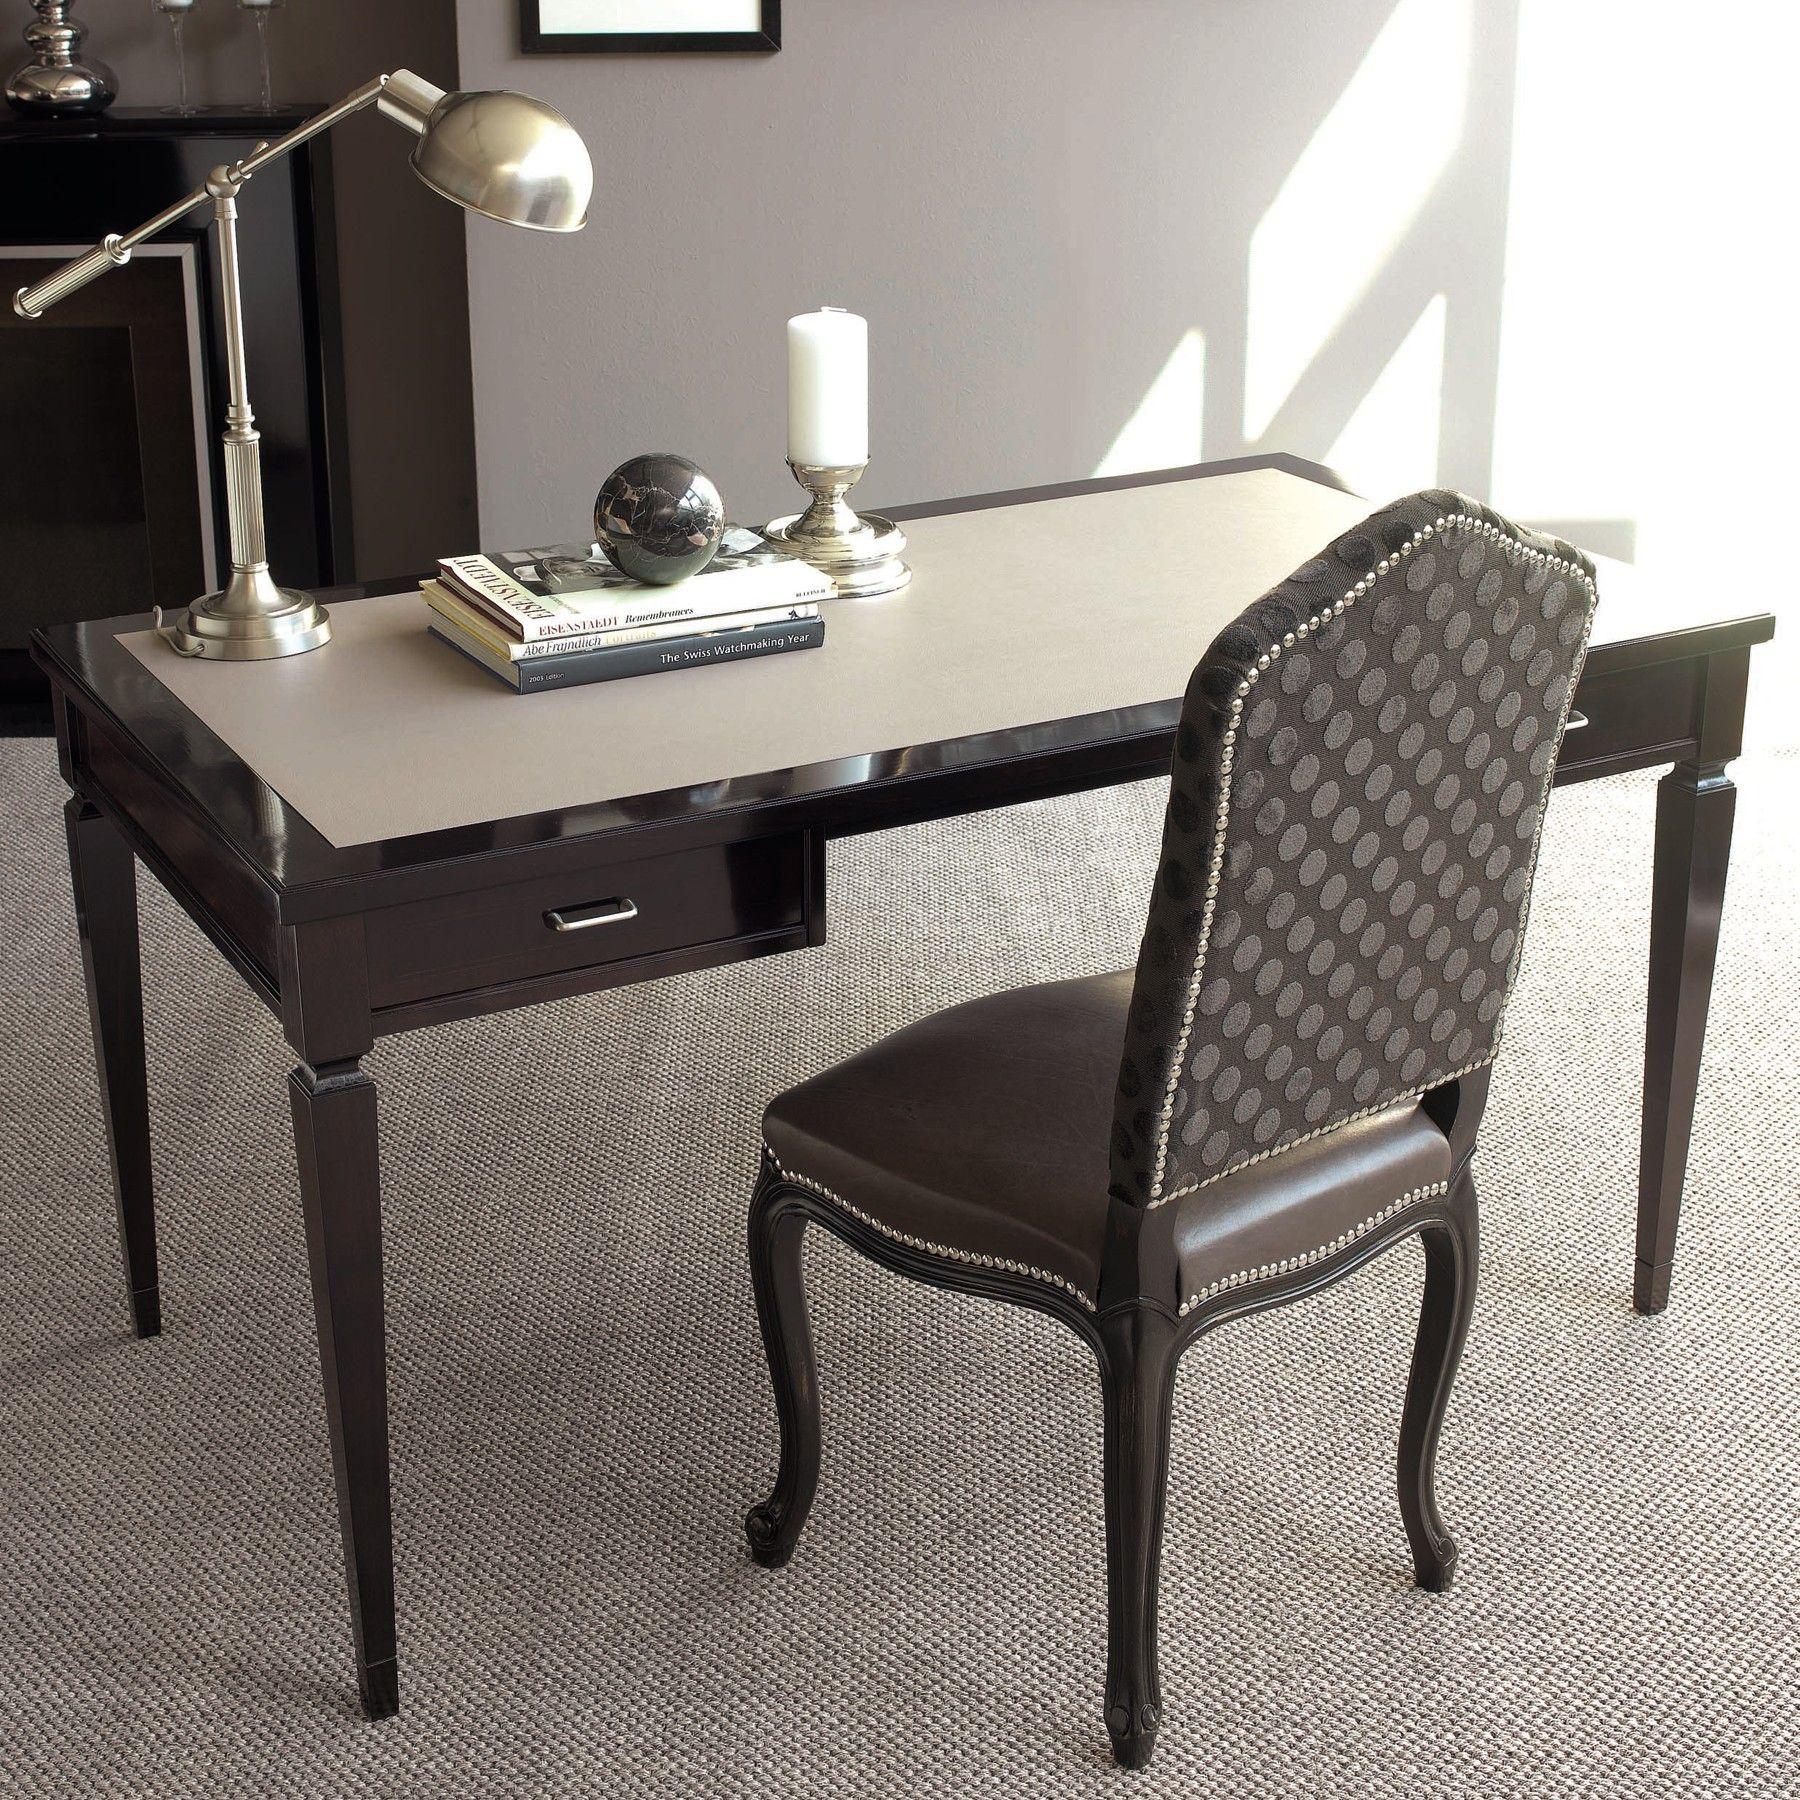 Galimberti nino emerald desk classic leather top twodrawers desk